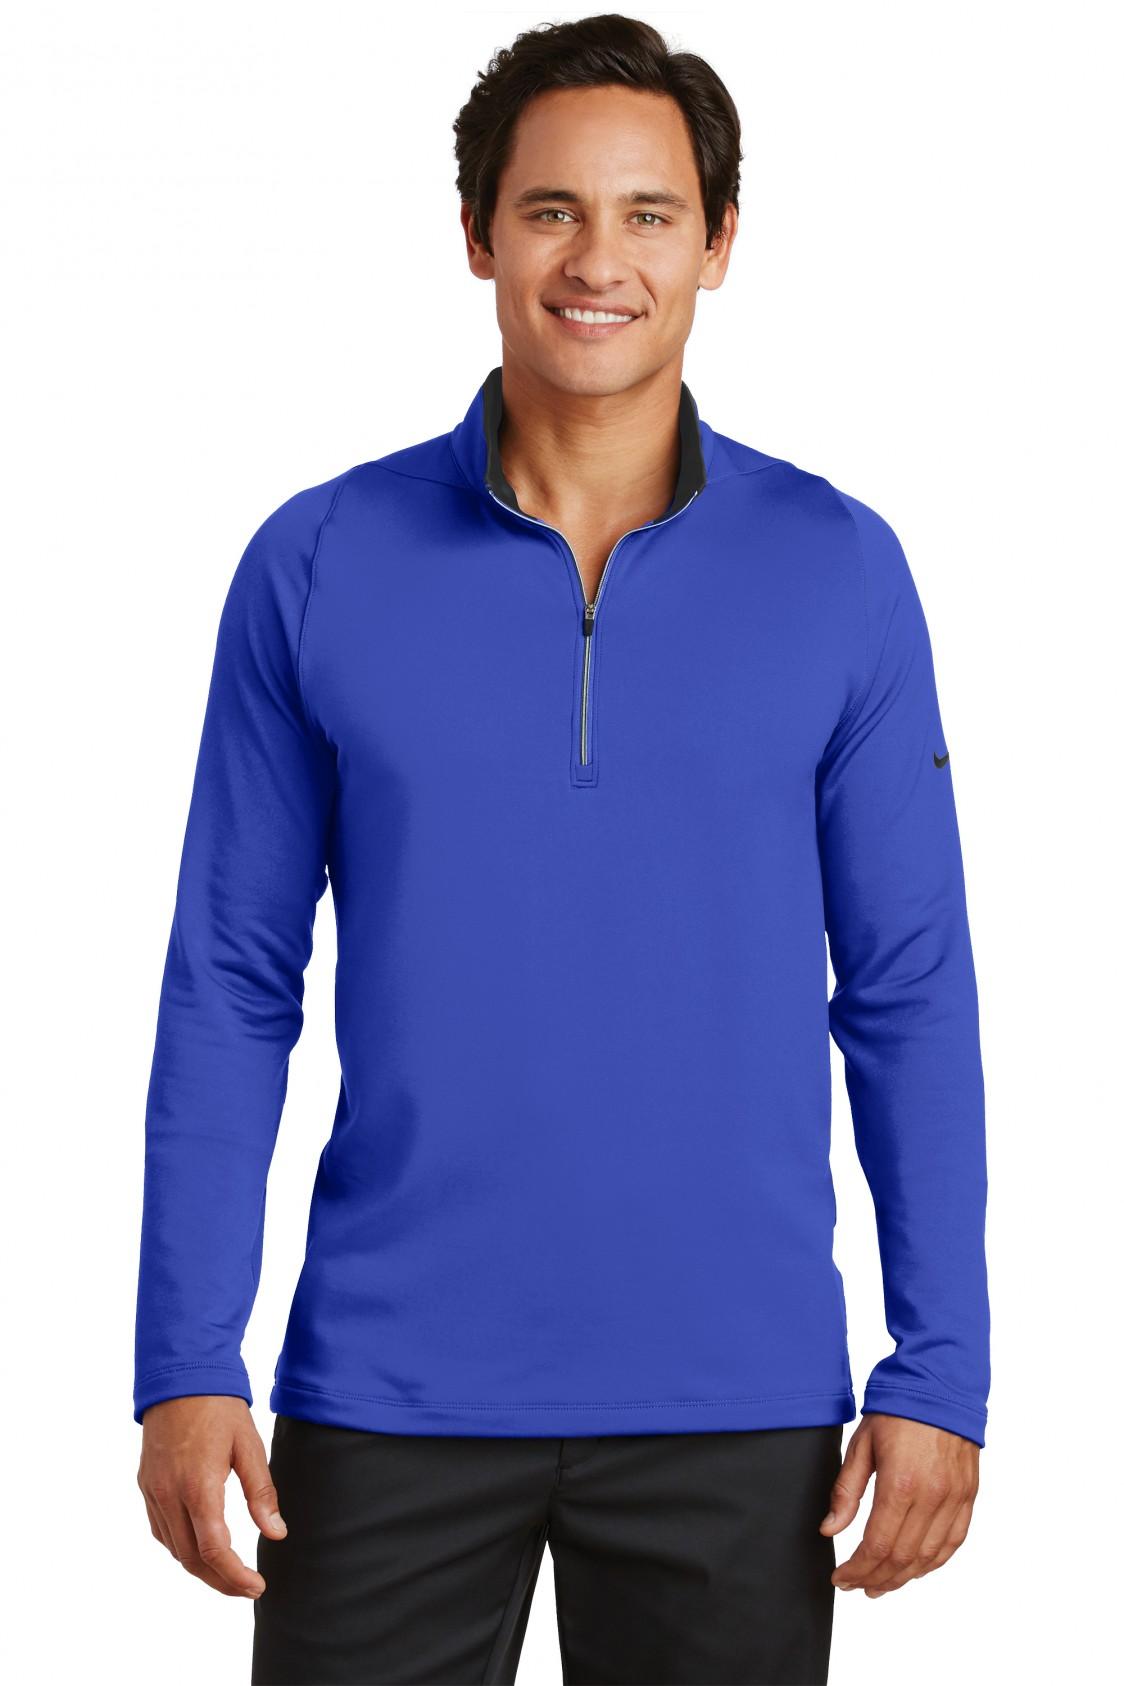 Nike Deep Royal Blue/Black